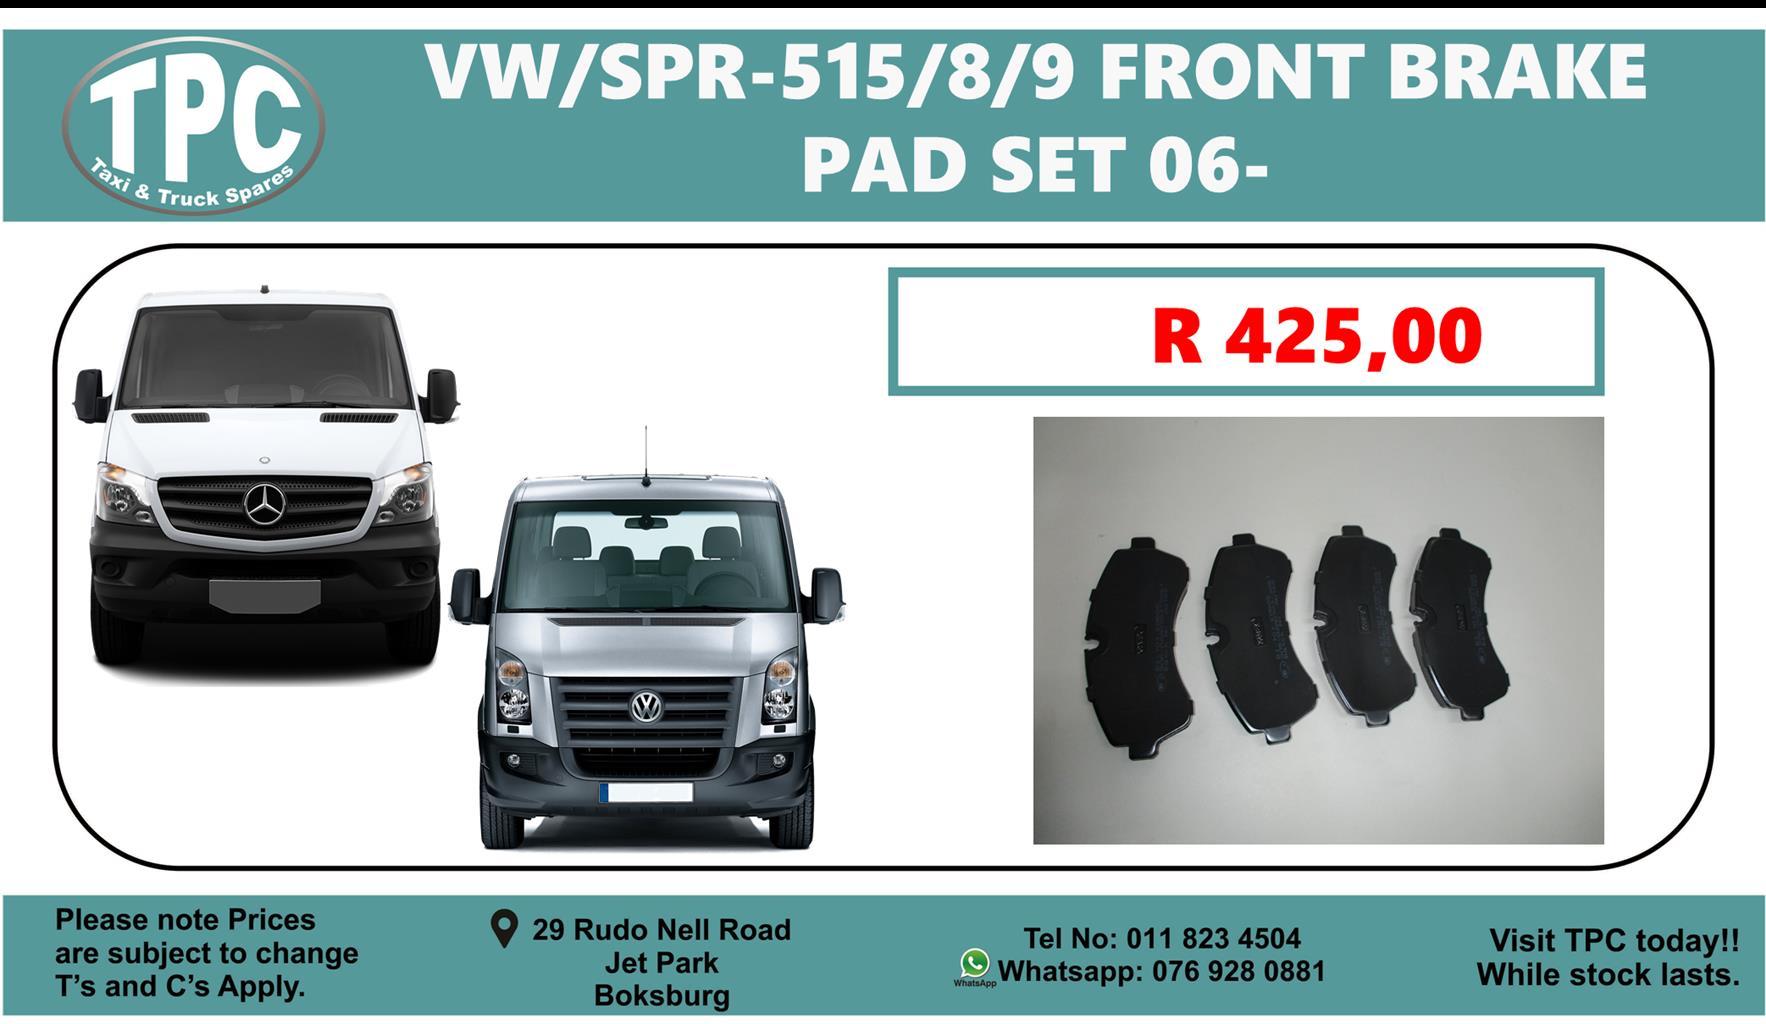 VW Crafter & Mercedes Benz Sprinter 515/8/9 Front Break Pad Set For Sale @ TPC